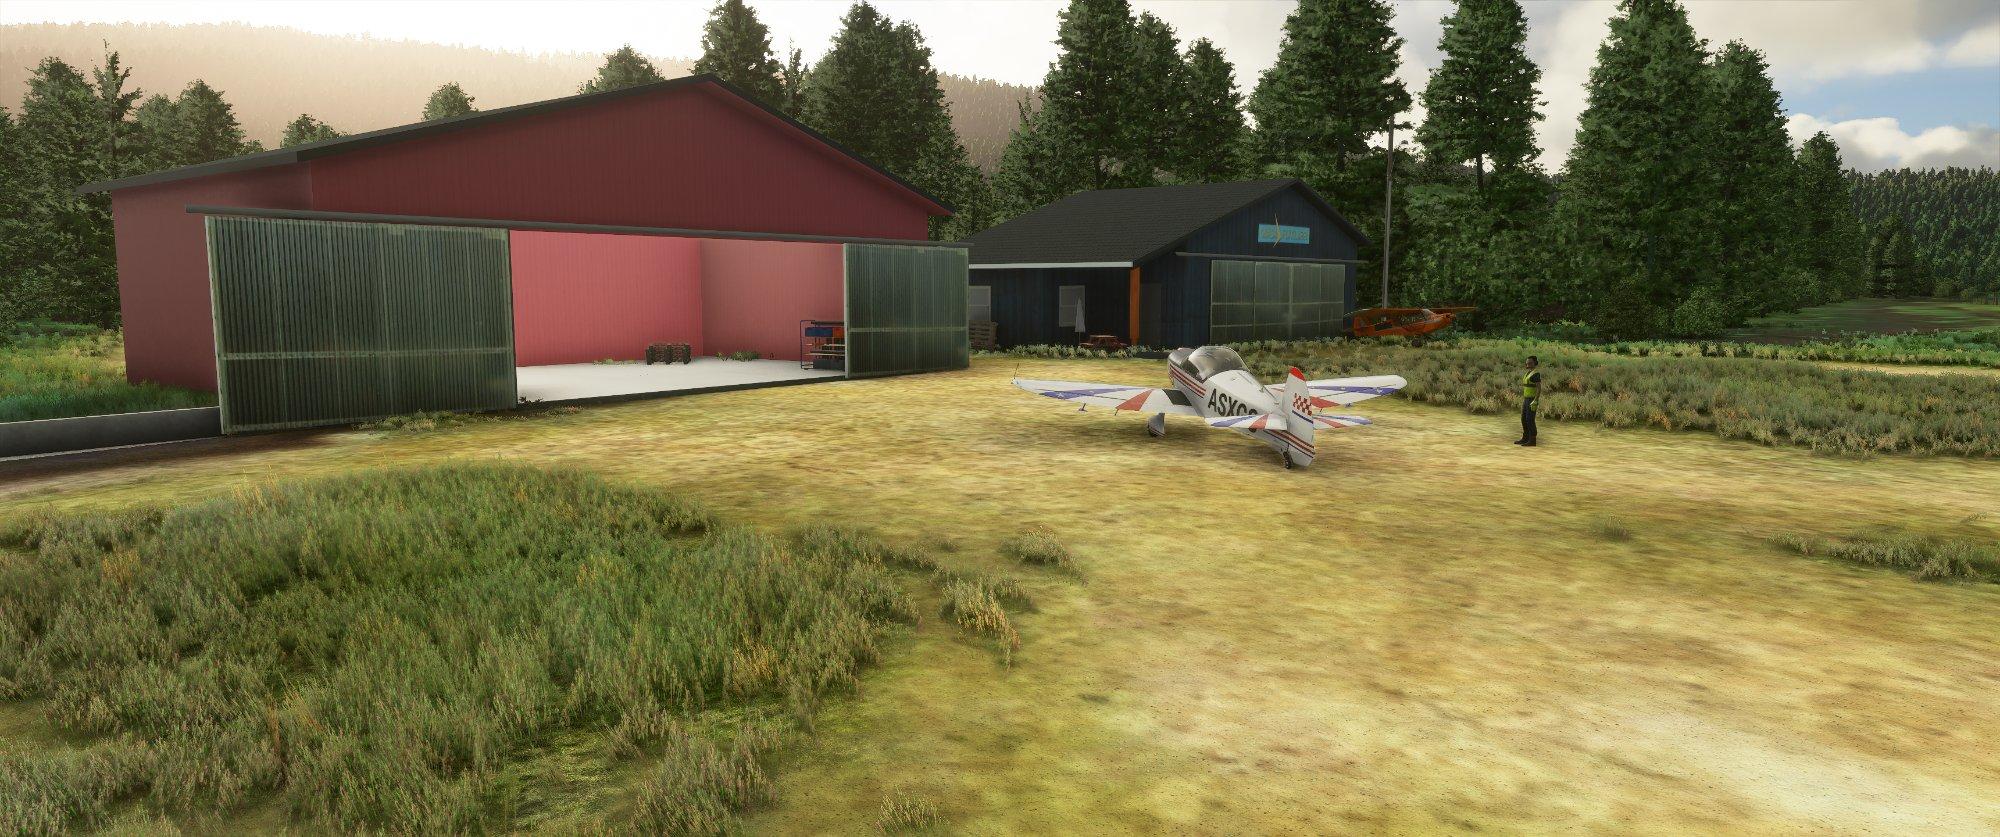 Microsoft Flight Simulator Screenshot 2020.10.03 - 00.28.53.53.jpg